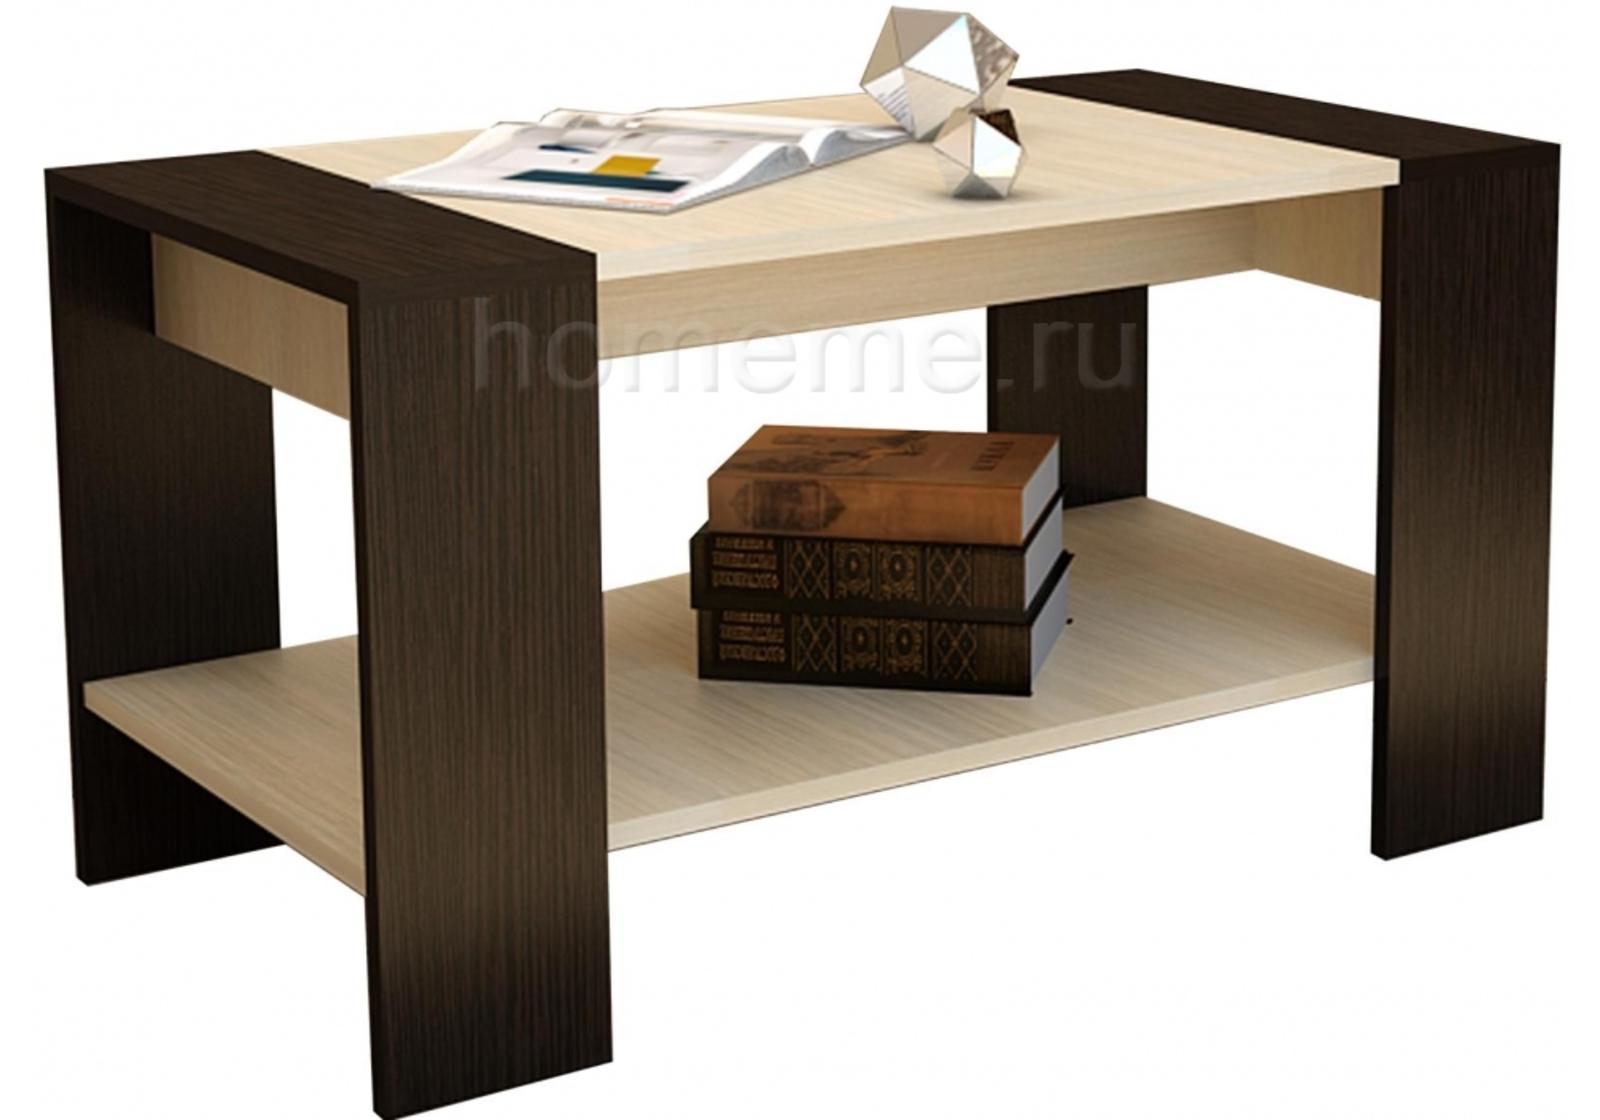 Кухонный стол HomeMe Квадро венге / дуб 294559 от Homeme.ru